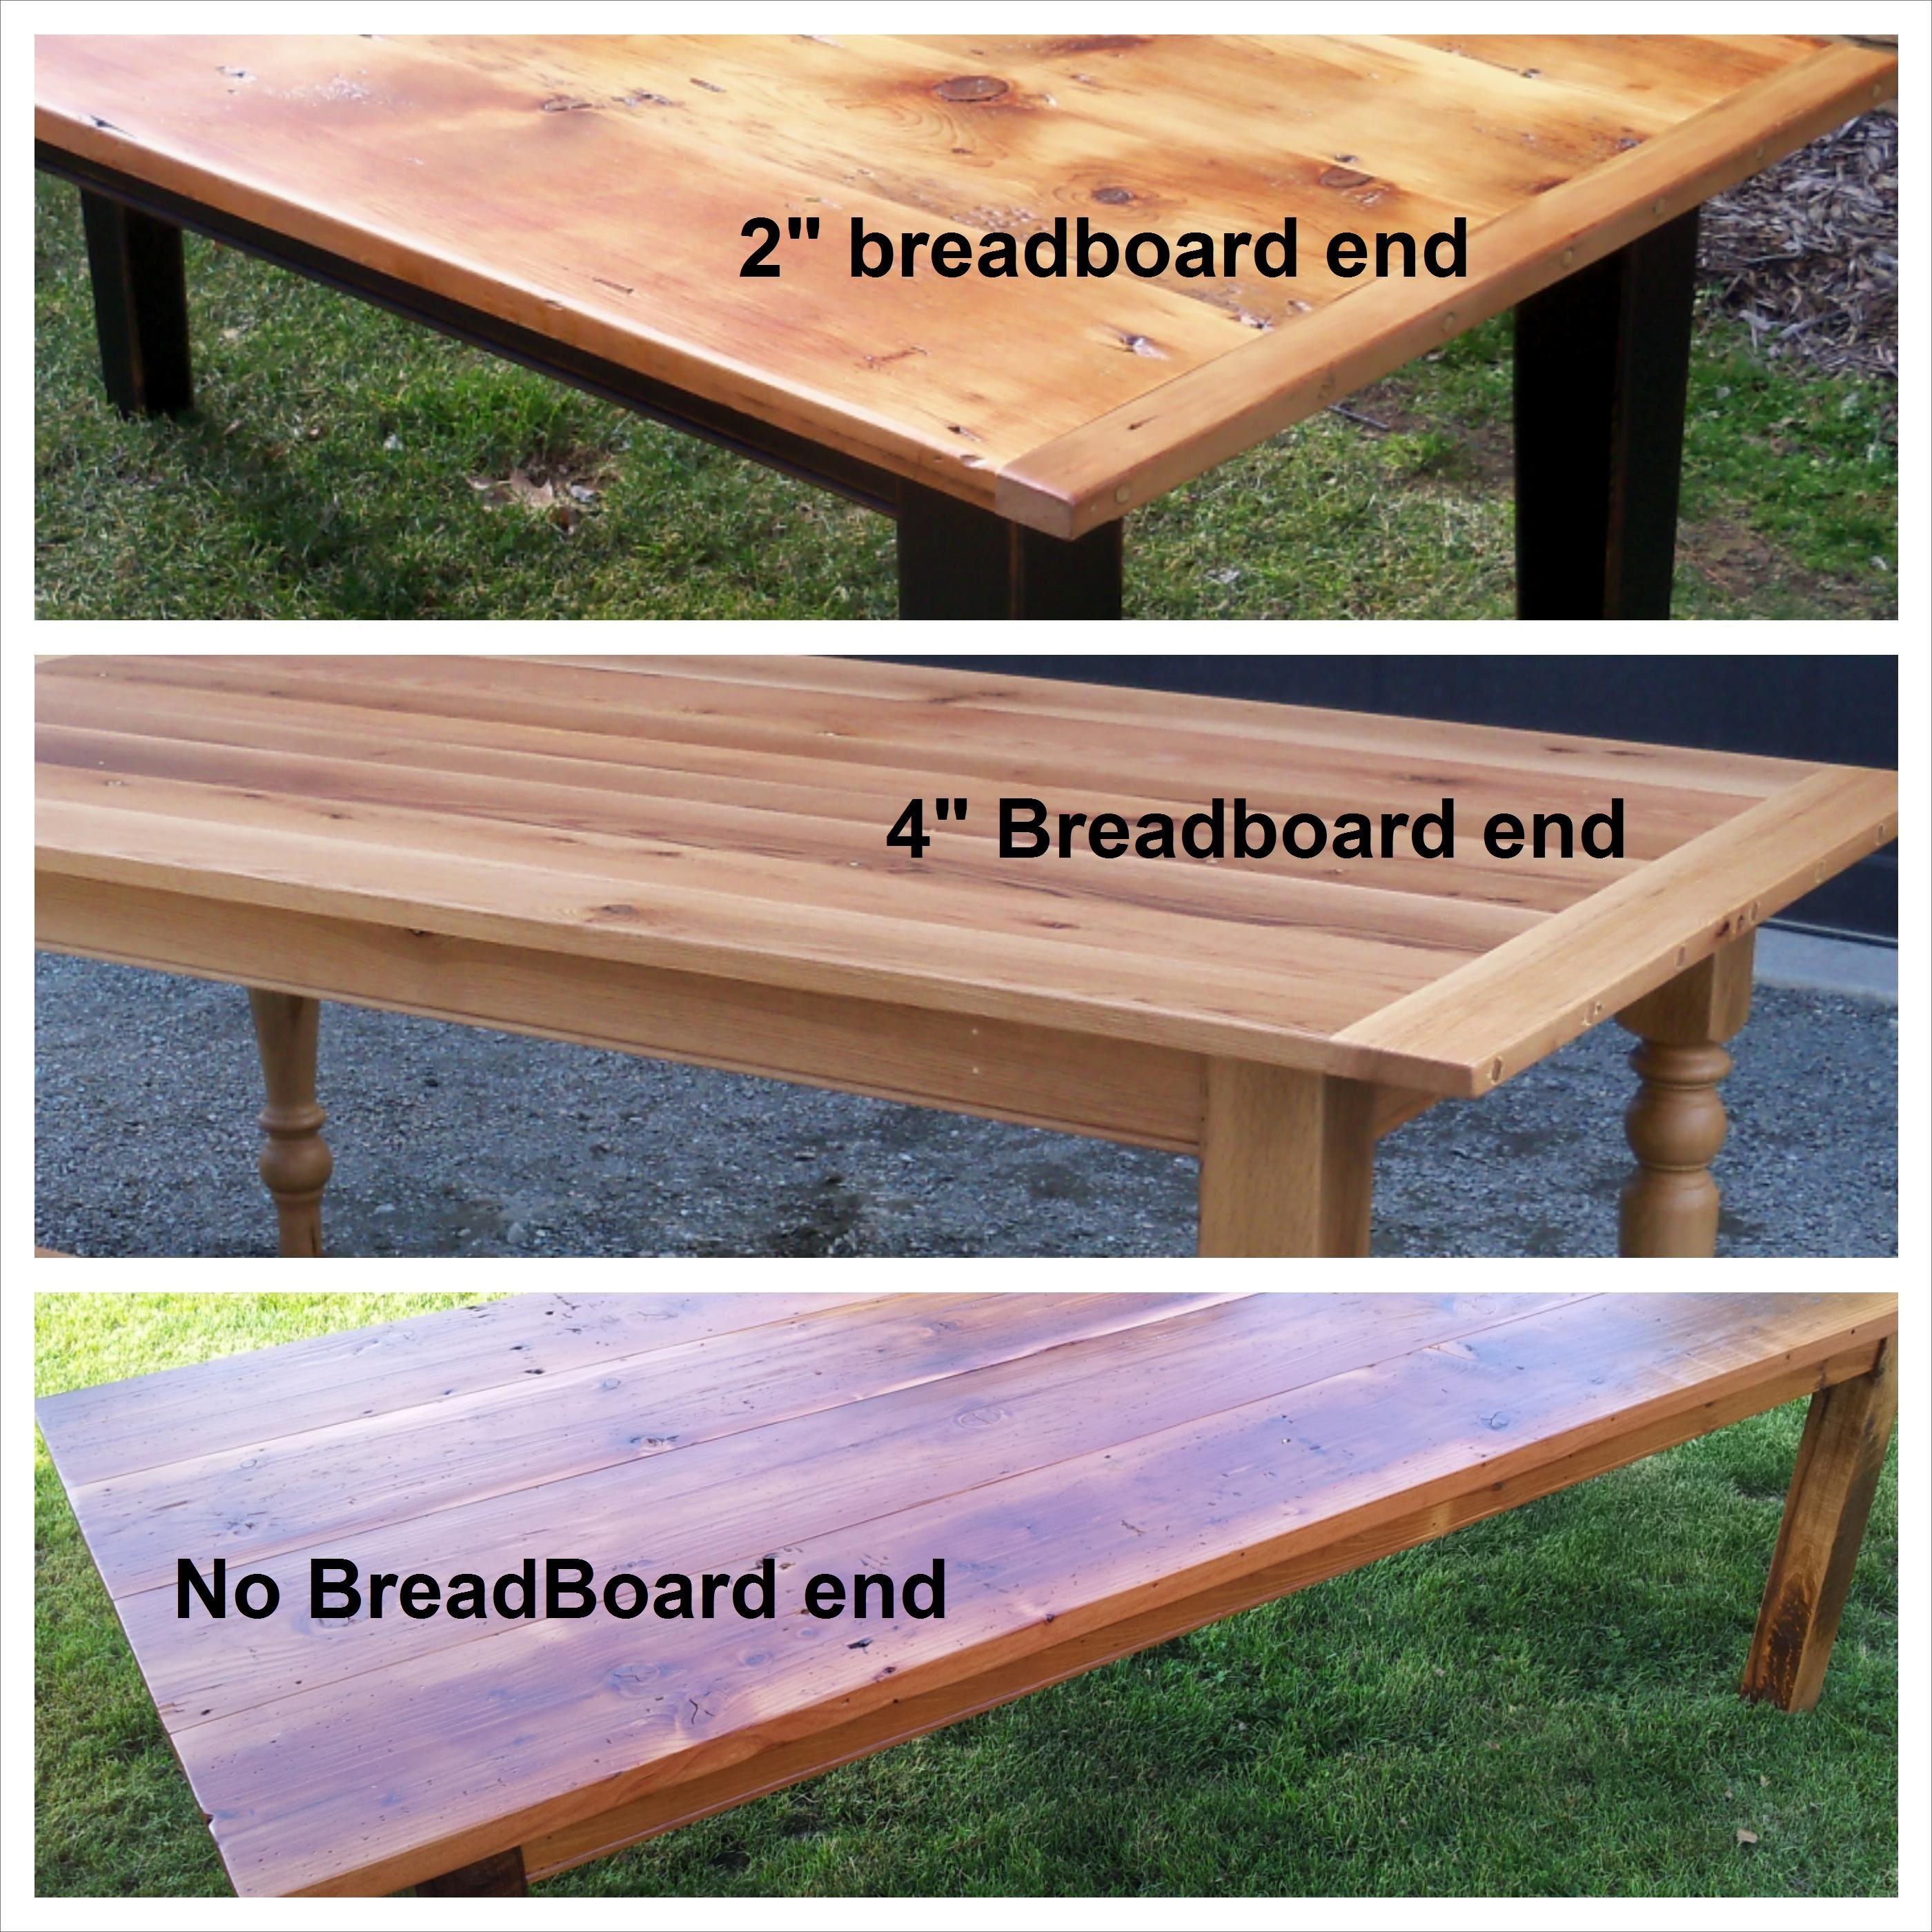 Breadboard Style Barnwood Table Top